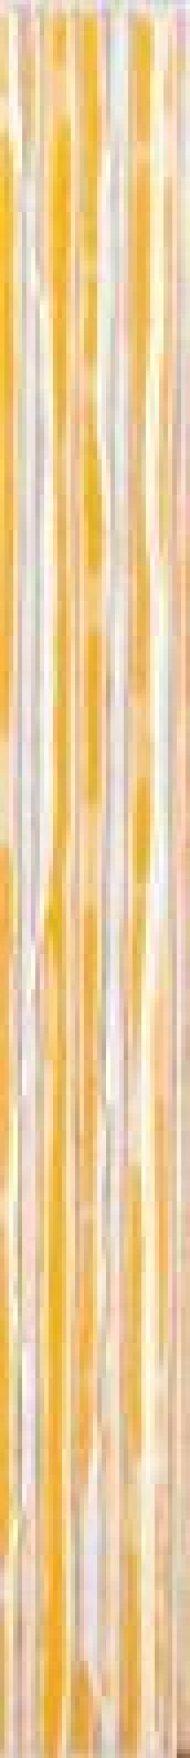 wlamh001-tulip-oranzova-listela.jpg